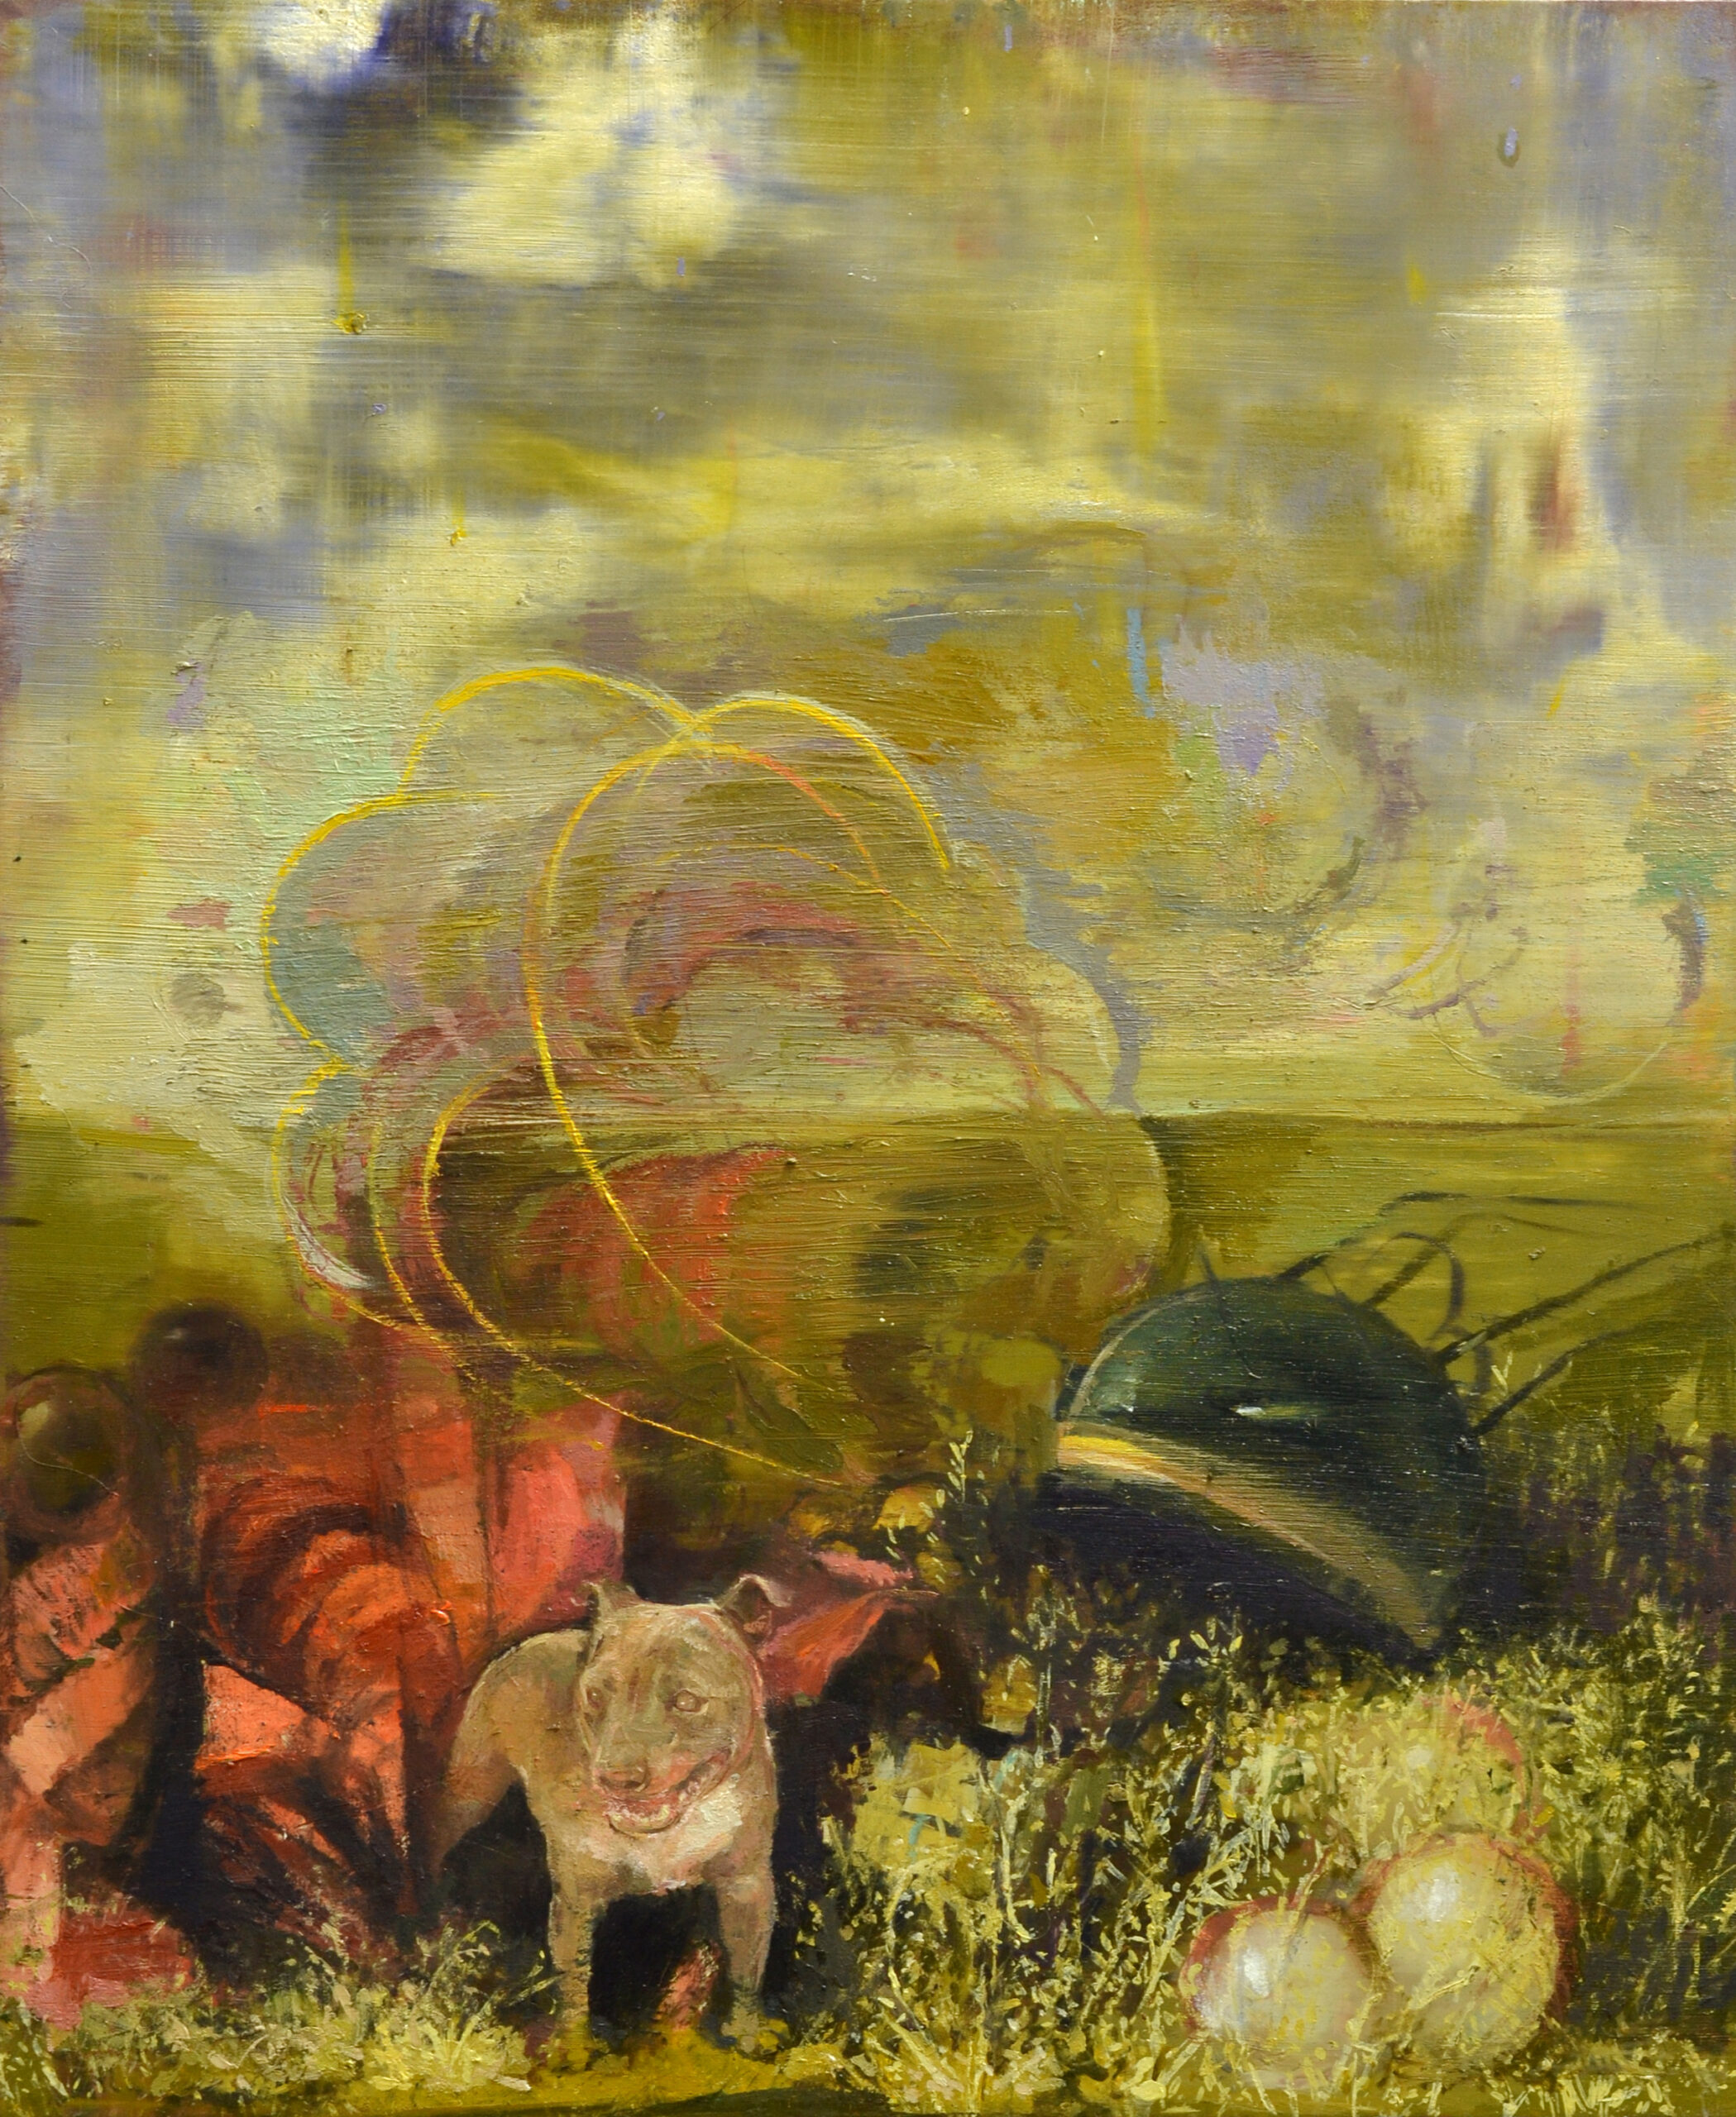 Laikas Rückkehr, 2020, 40x33 cm, Öl auf Alu